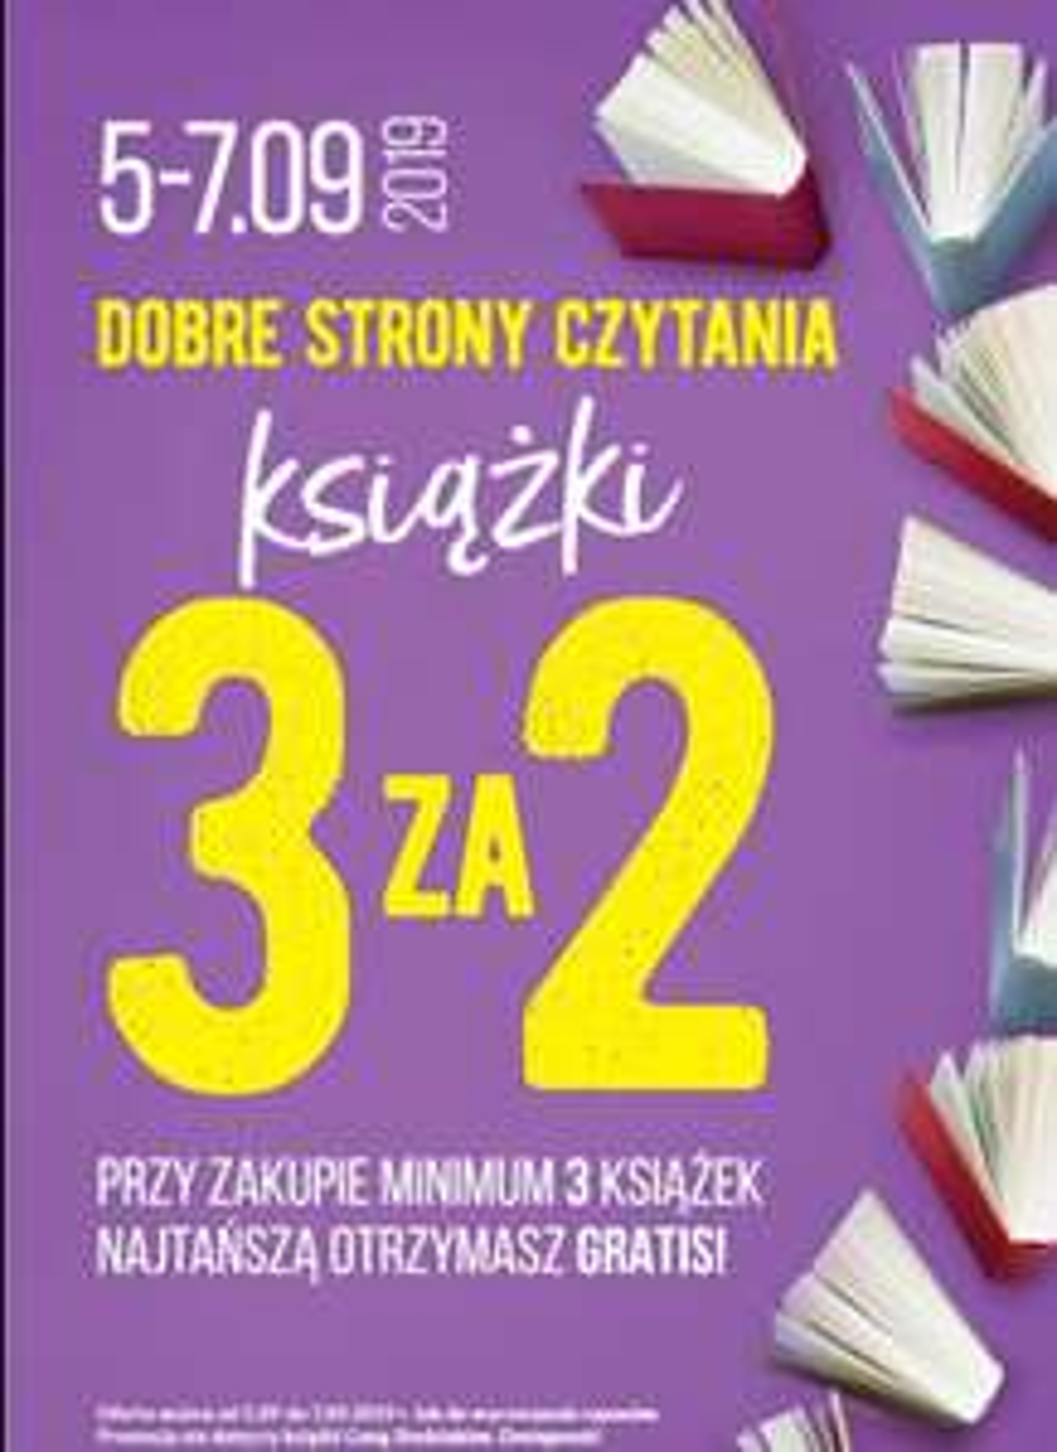 Książki 3 za 2 - Biedronka